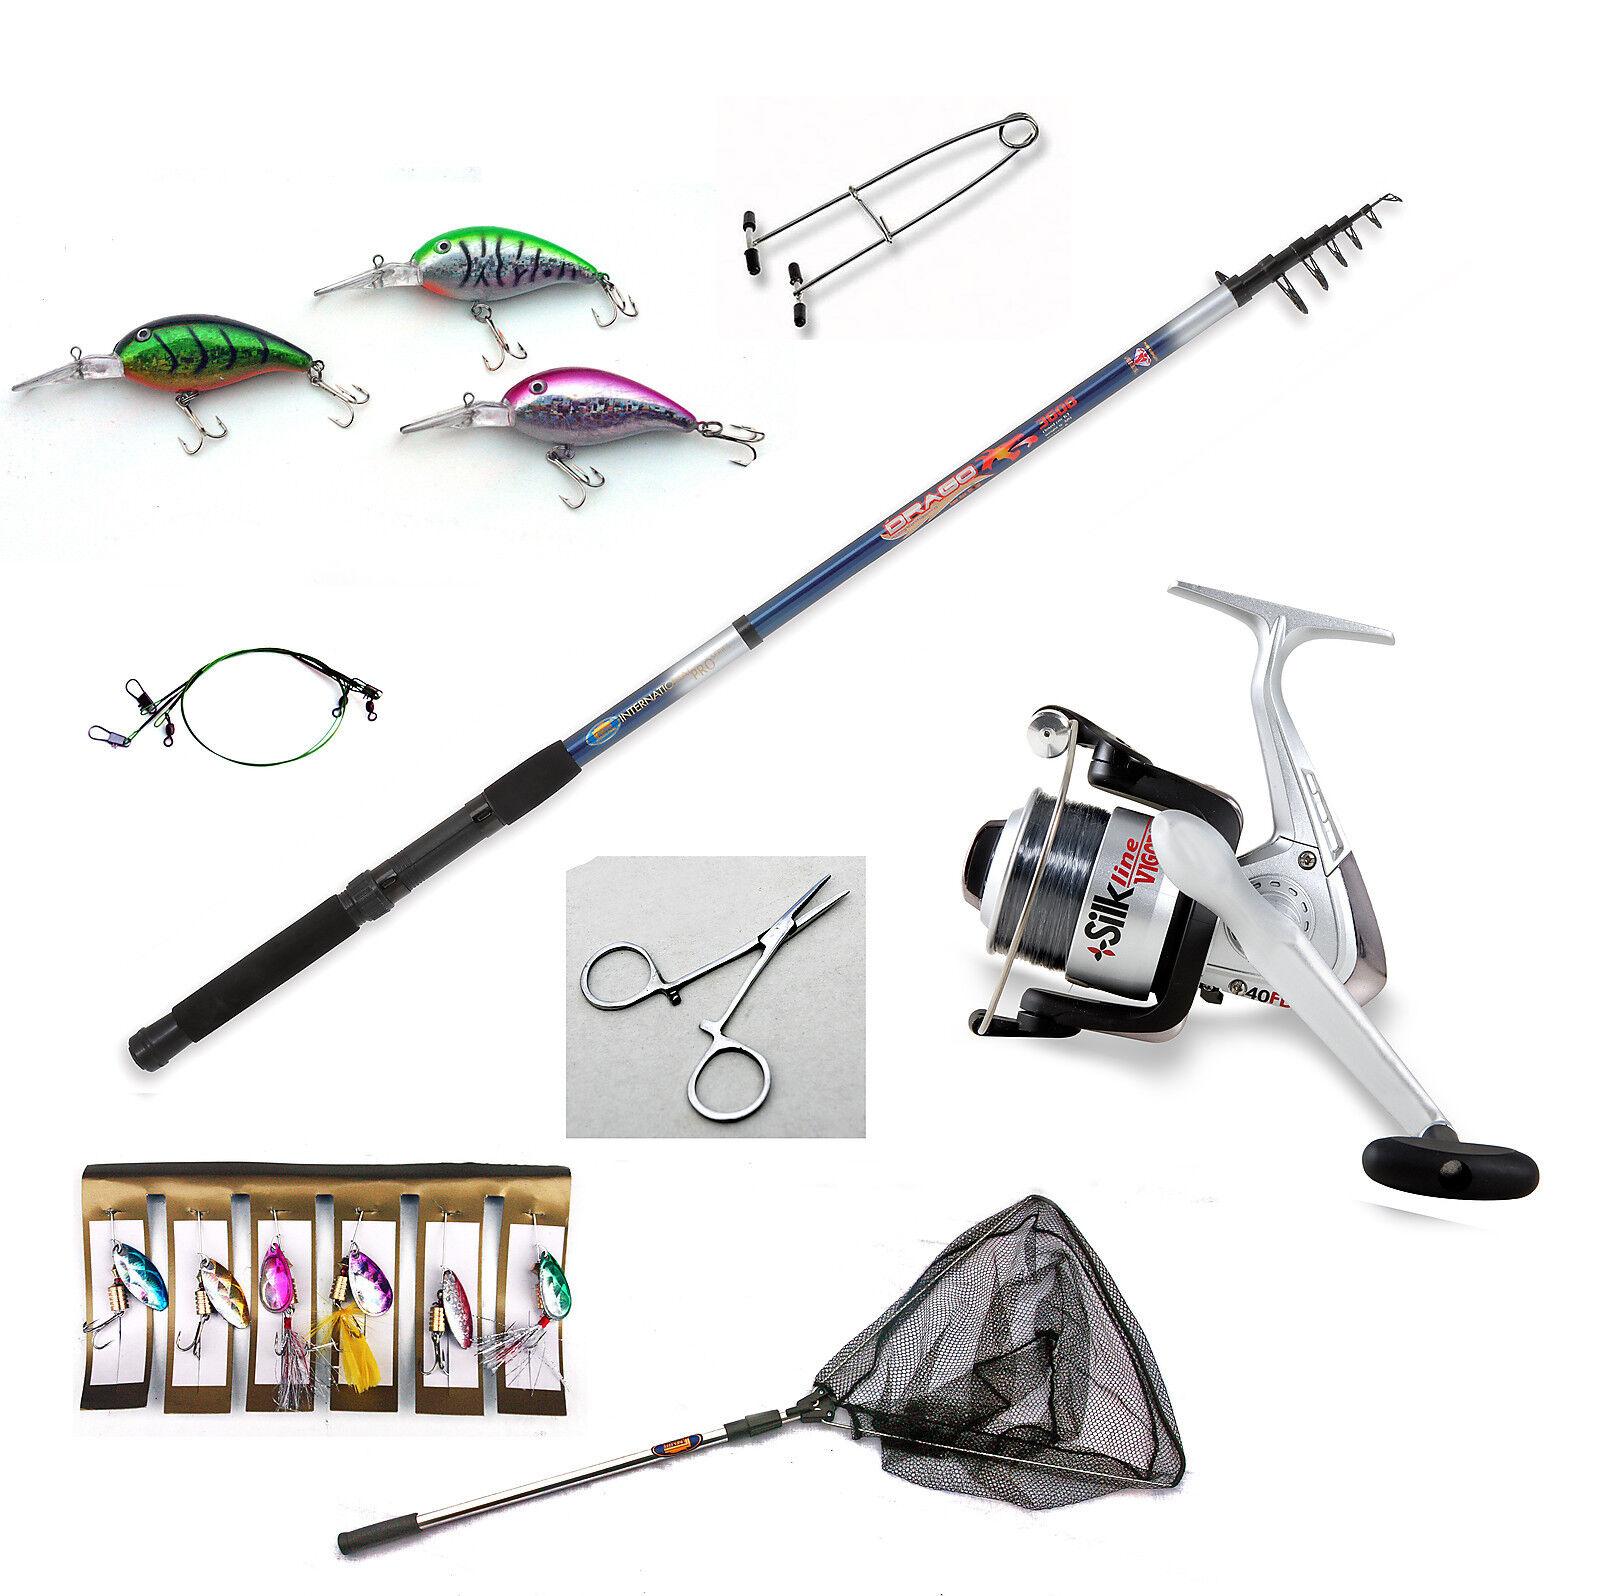 Telescopic Pike fishing Bundle - Rod reel,plugs,traces,line,net-Choice of rods